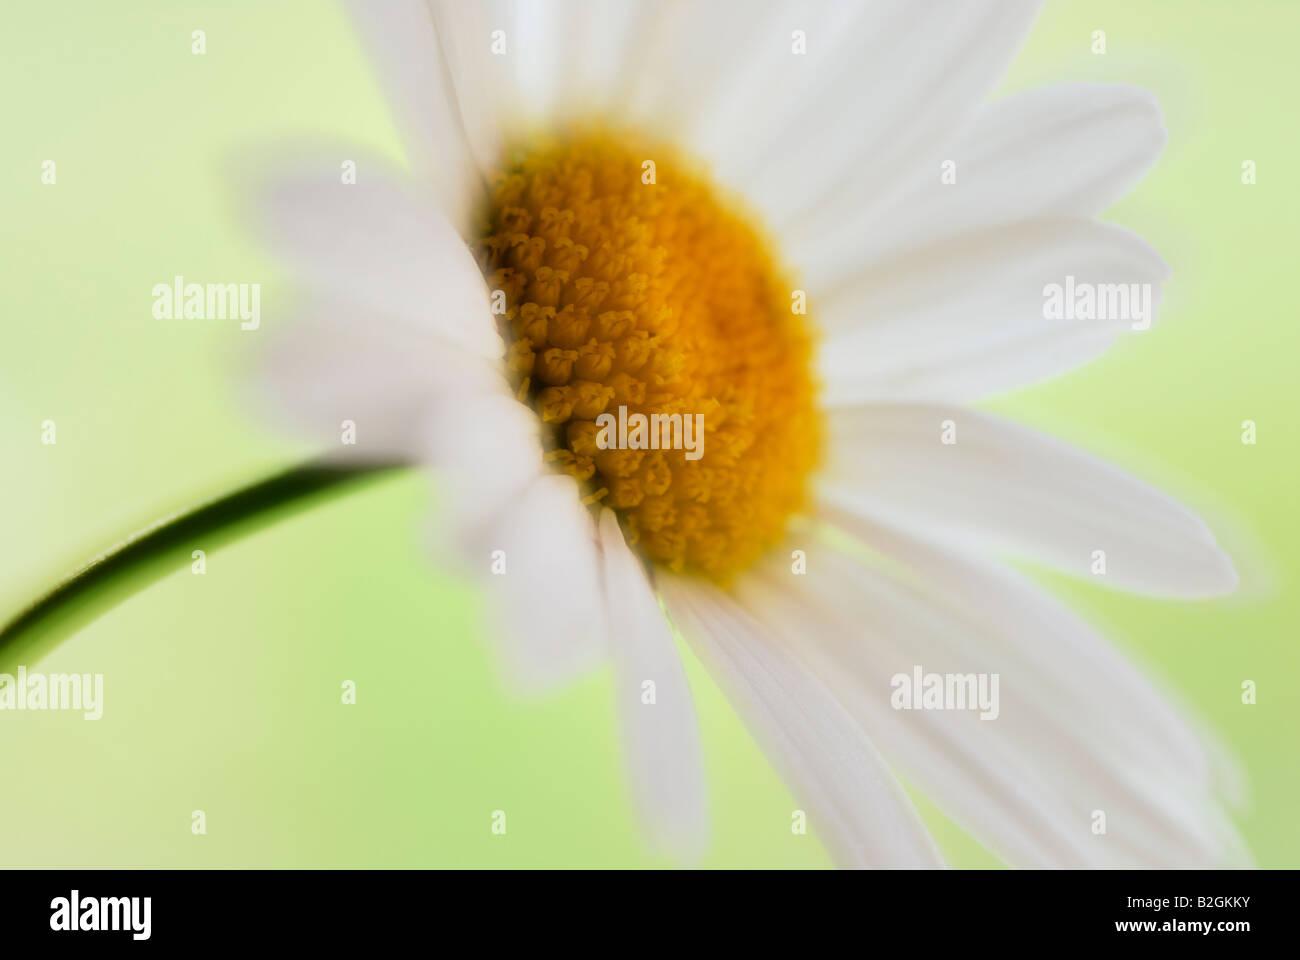 Oxeye daisy Leucanthemum vulgare pianta flowering bloom blossom blooming alambicchi ancora gli sfondi sfondo pattern Immagini Stock